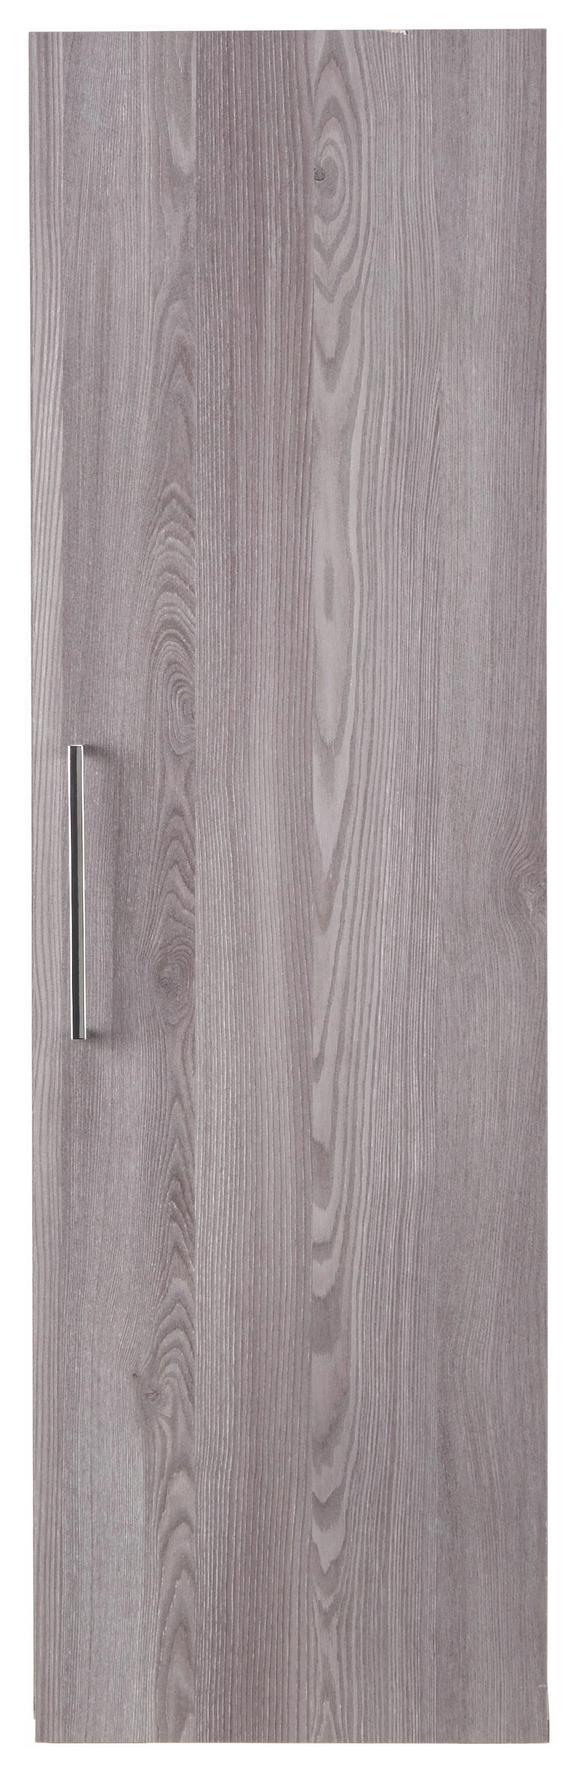 Viseči Element Dark - srebrna, Moderno, kovina/umetna masa (35/116/35cm) - Premium Living